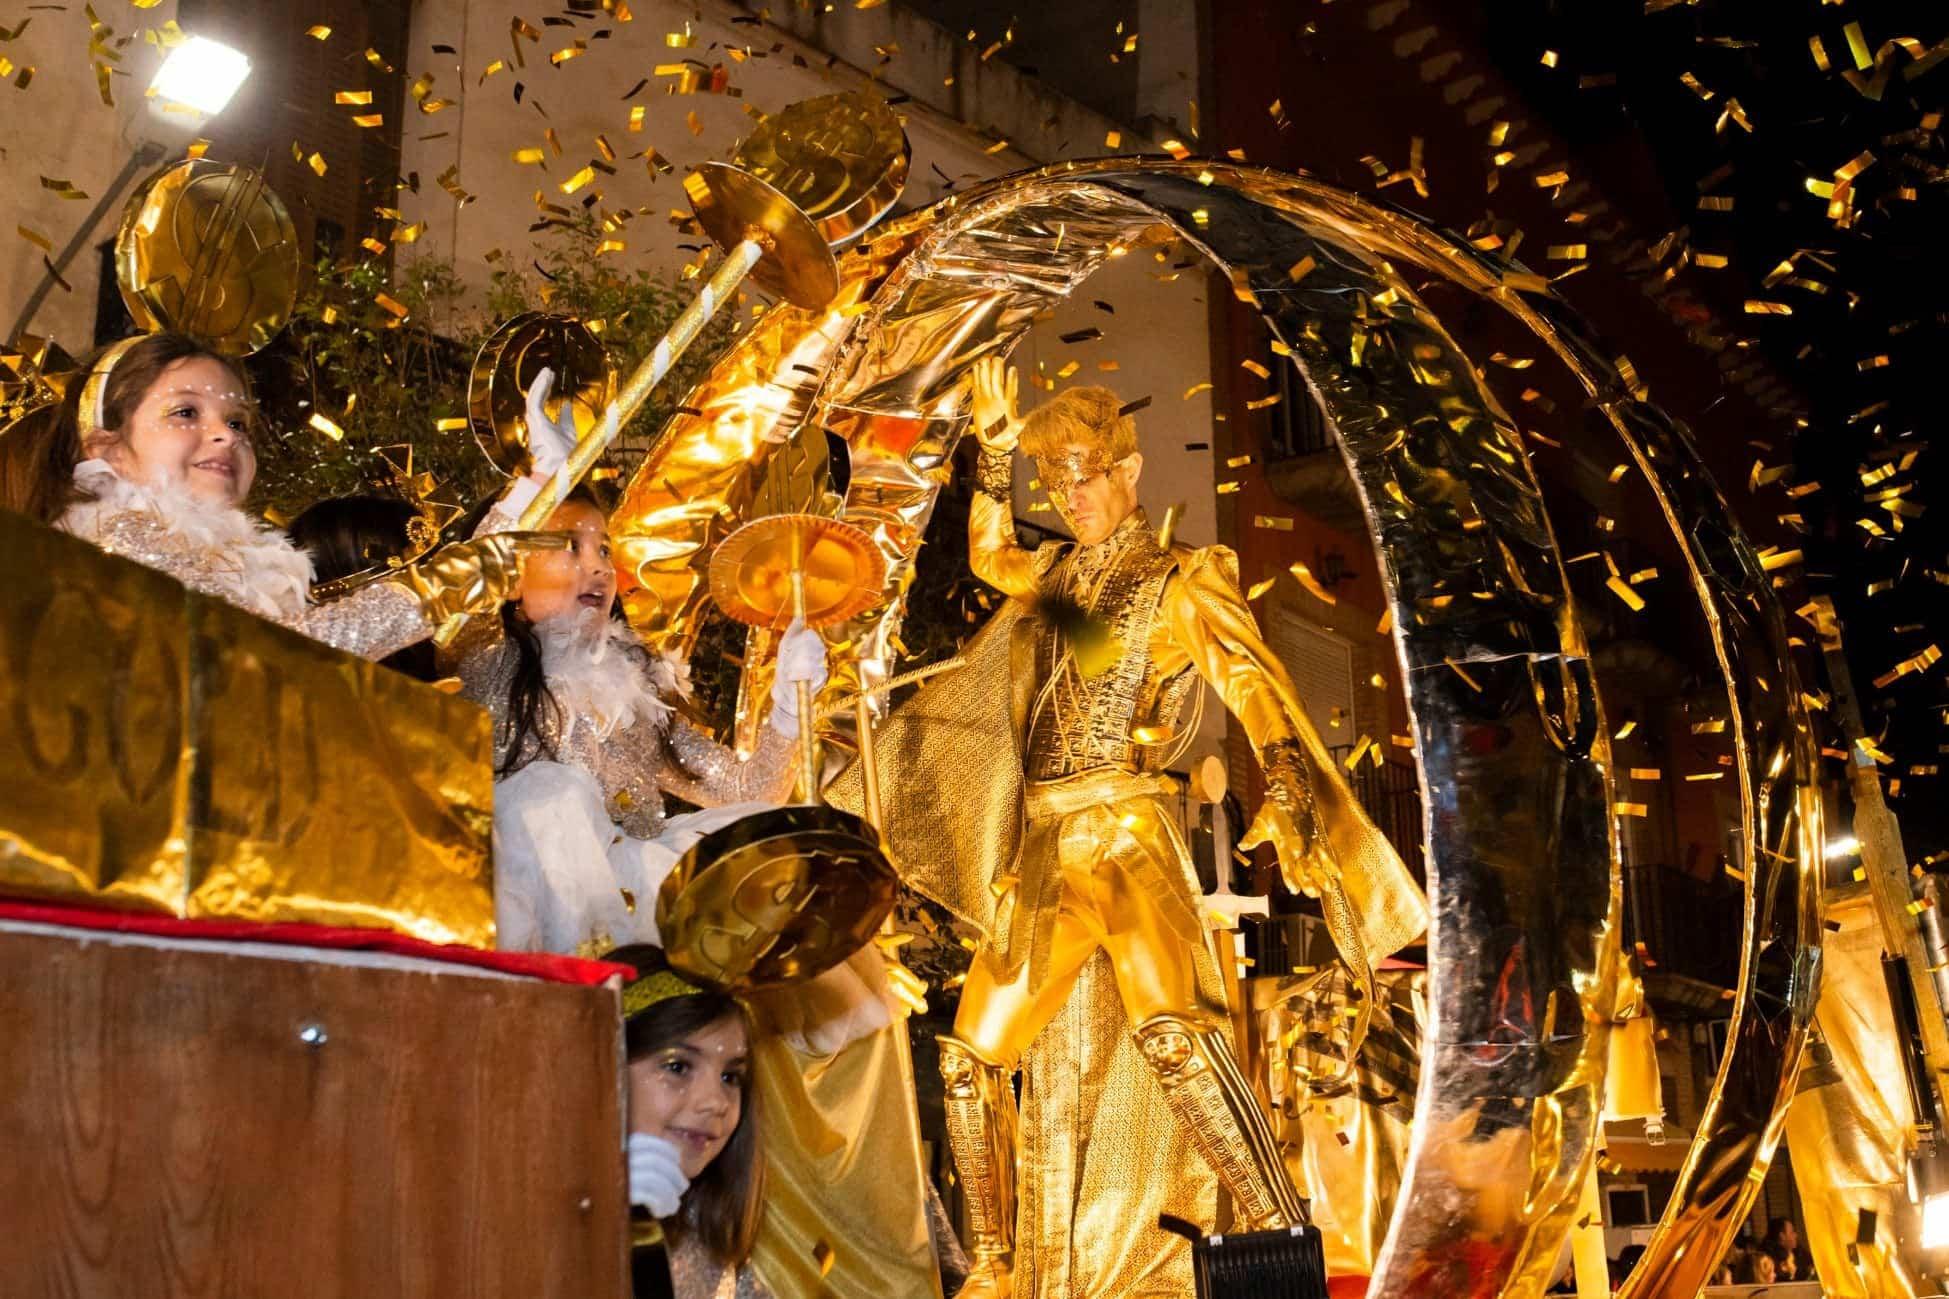 Carnaval de herencia 2020 ofertorio 85 - Selección de fotografías del Ofertorio del Carnaval de Herencia